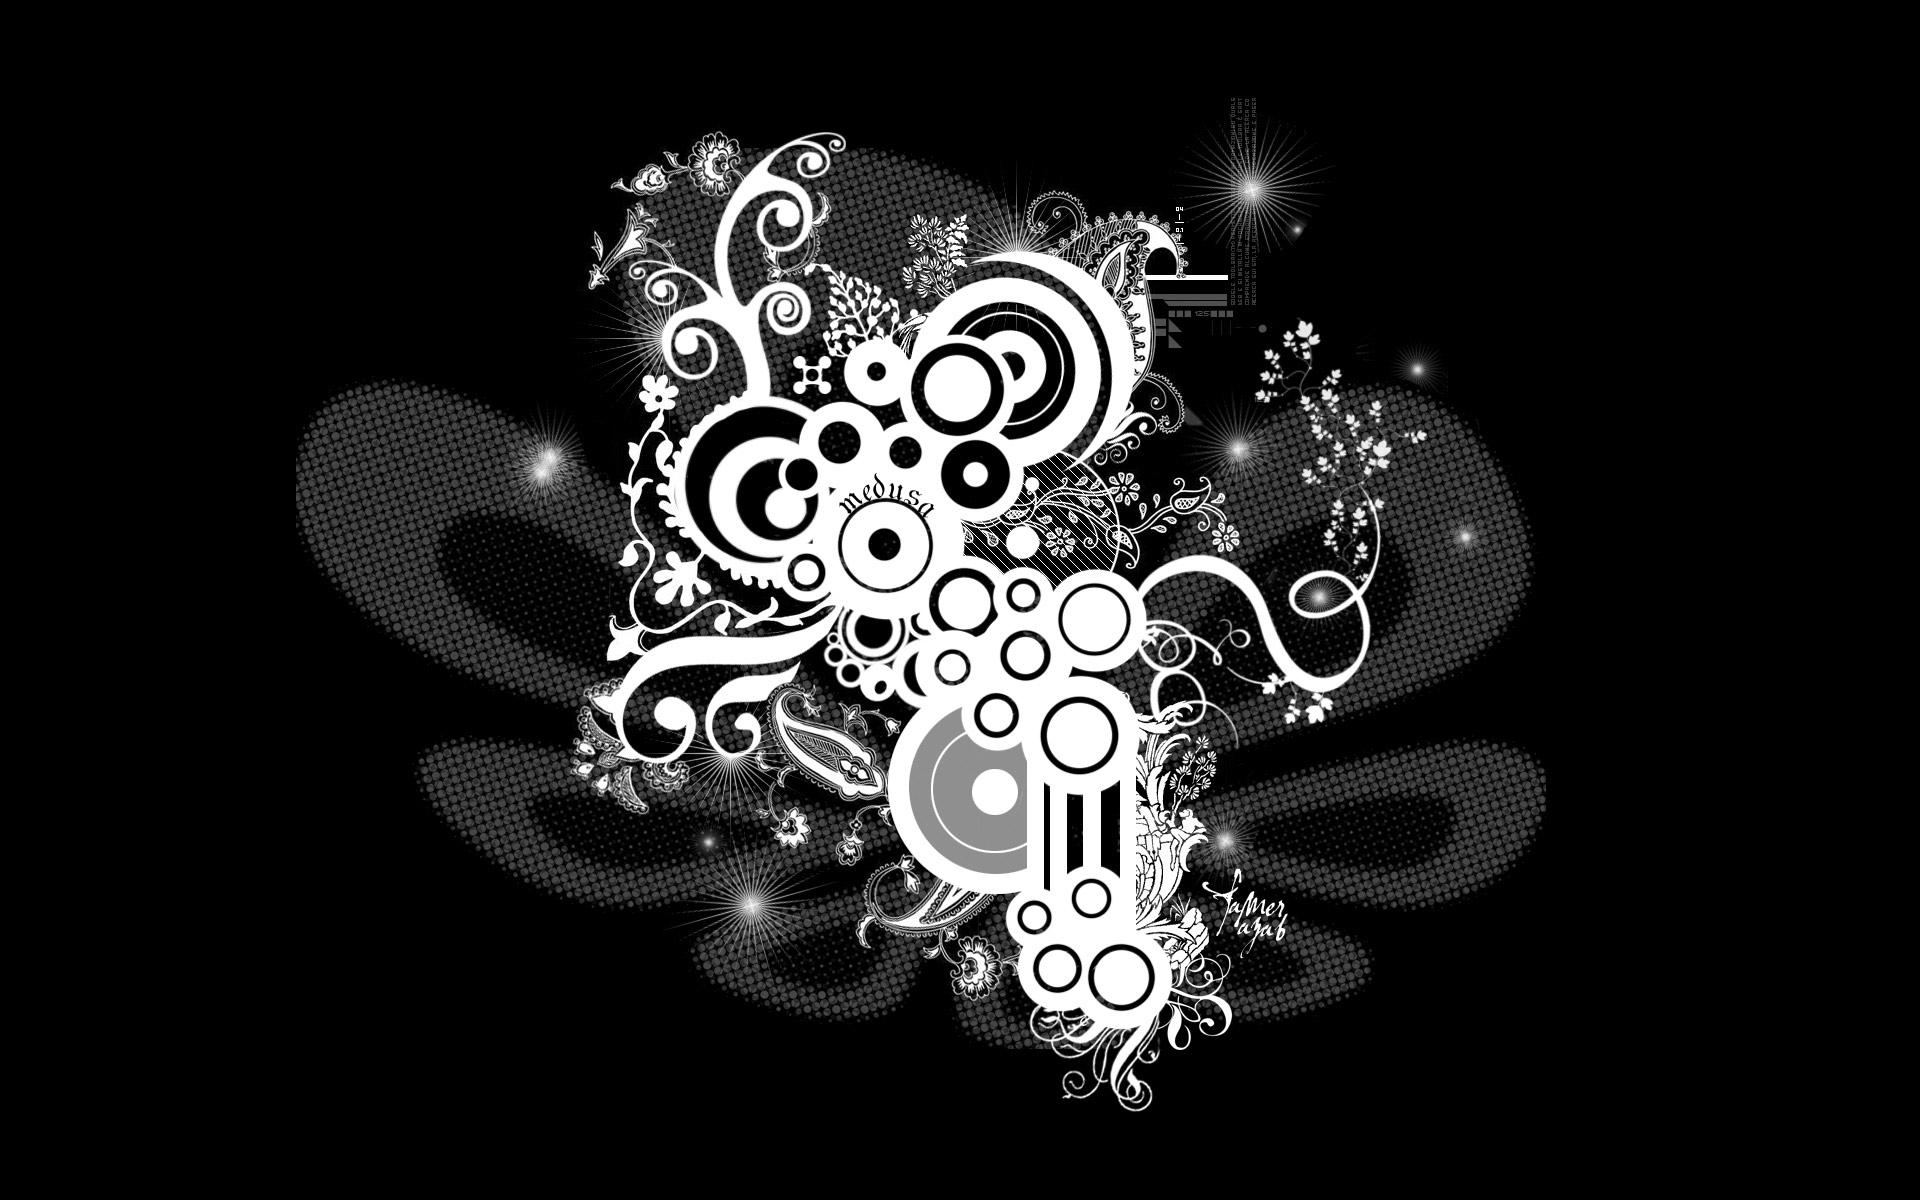 Black And White Desktop Wallpaper Designs Hd Black and white desktop 1920x1200